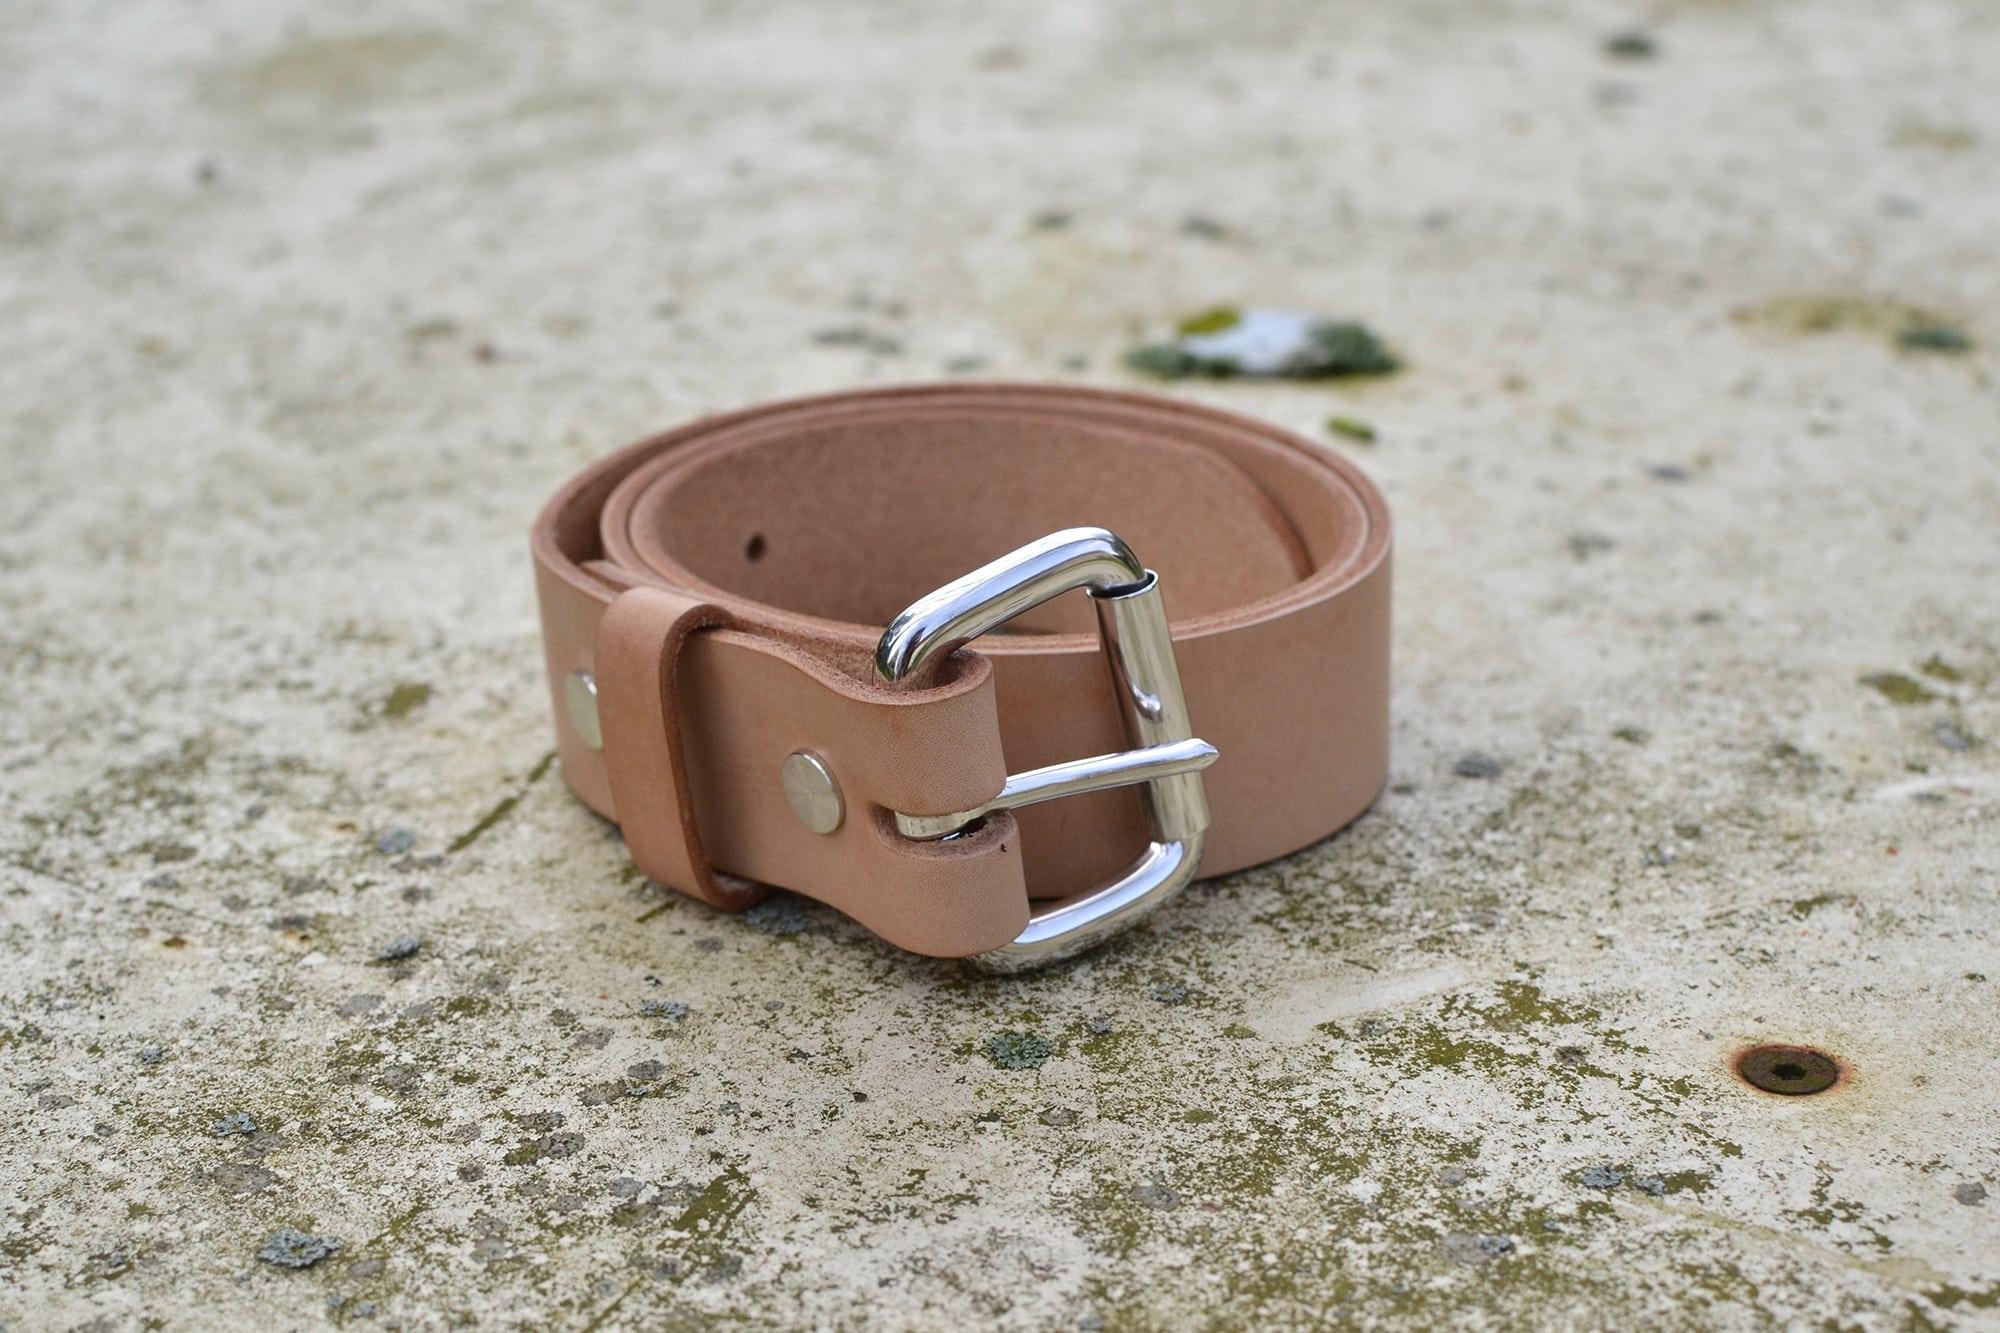 ceinture sympa bonnard sympa bo en cuir naturel faite en Suisse